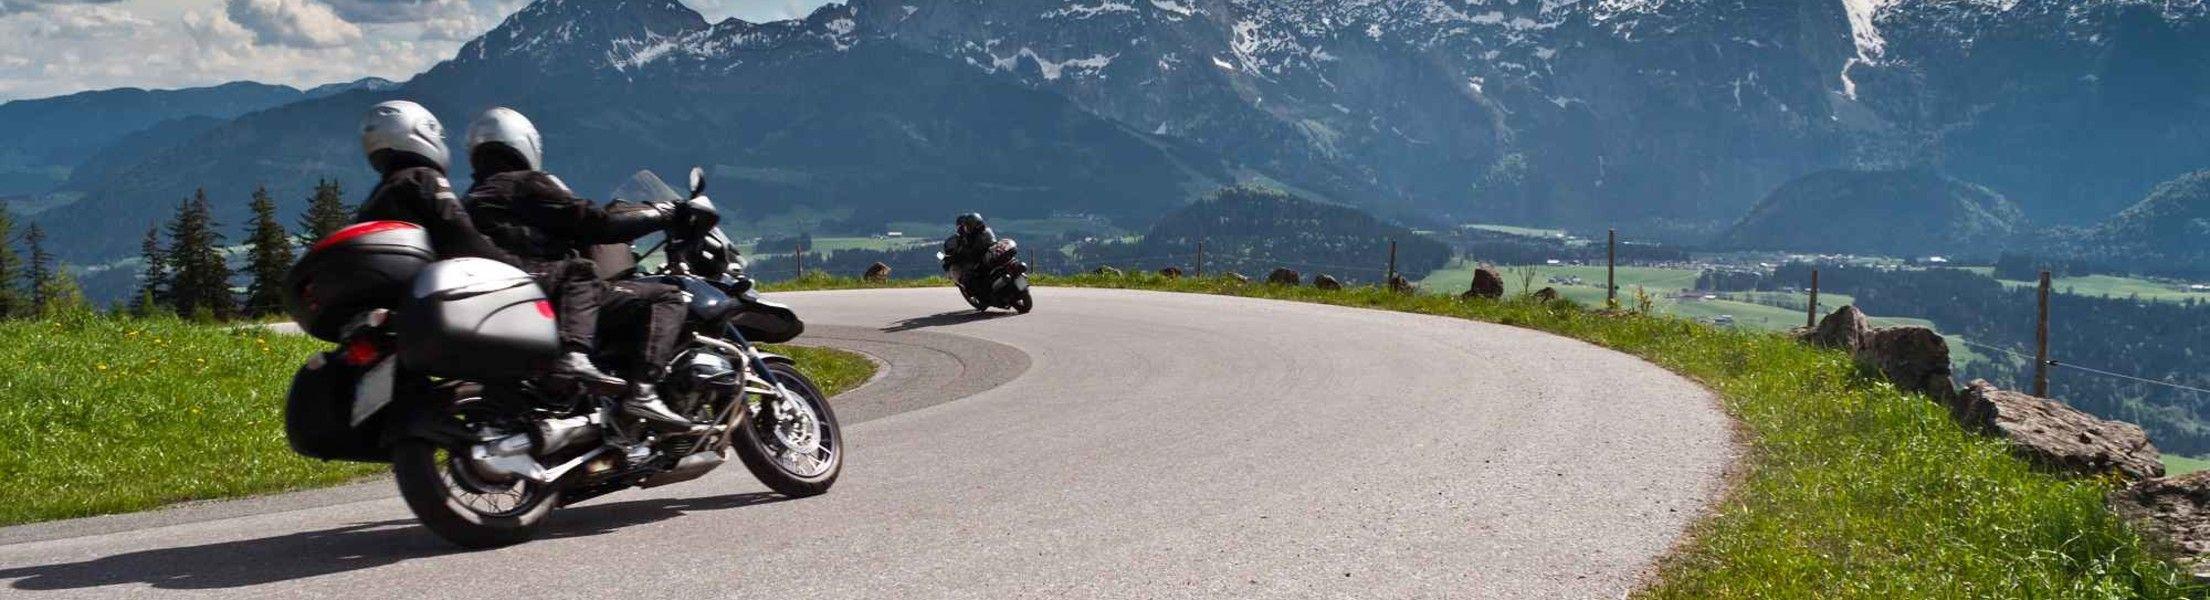 Motorradfahrer in Kurve in den Alpen